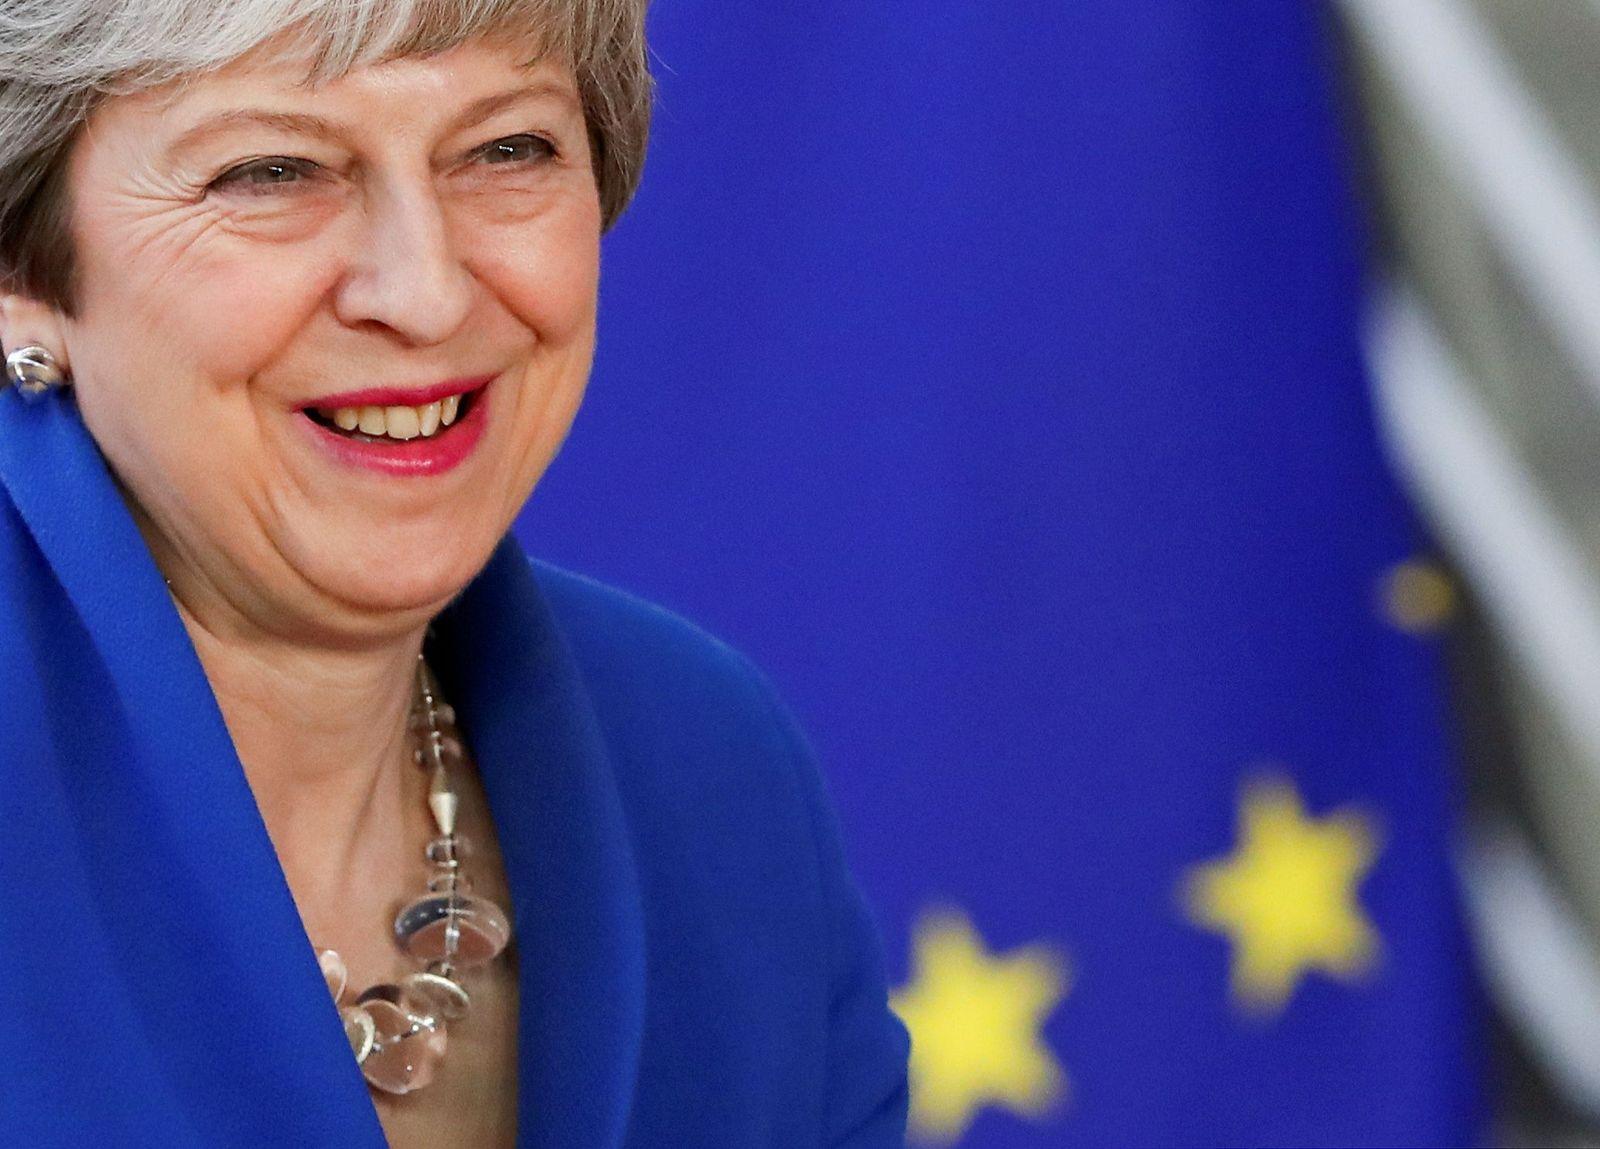 BRITAIN-EU/SUMMIT